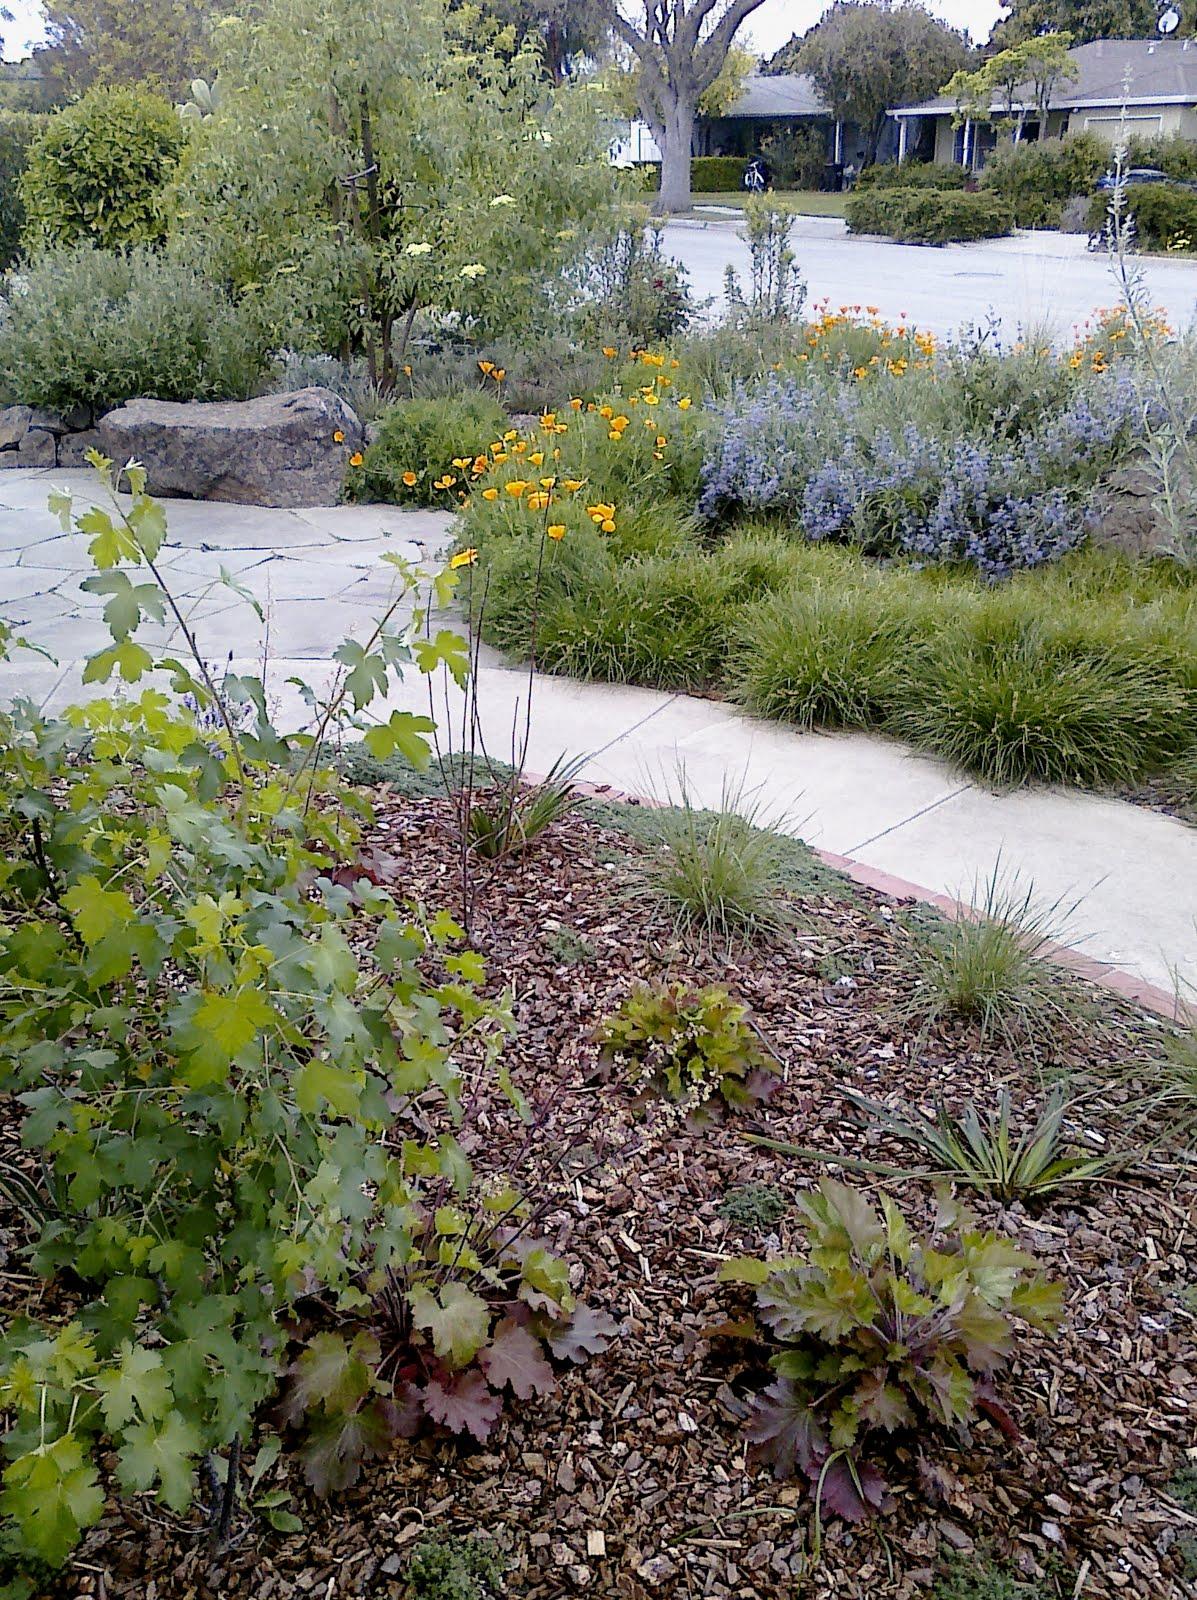 Life s garden sunnyvale garden ftempo - Olive garden apartments sunnyvale ...